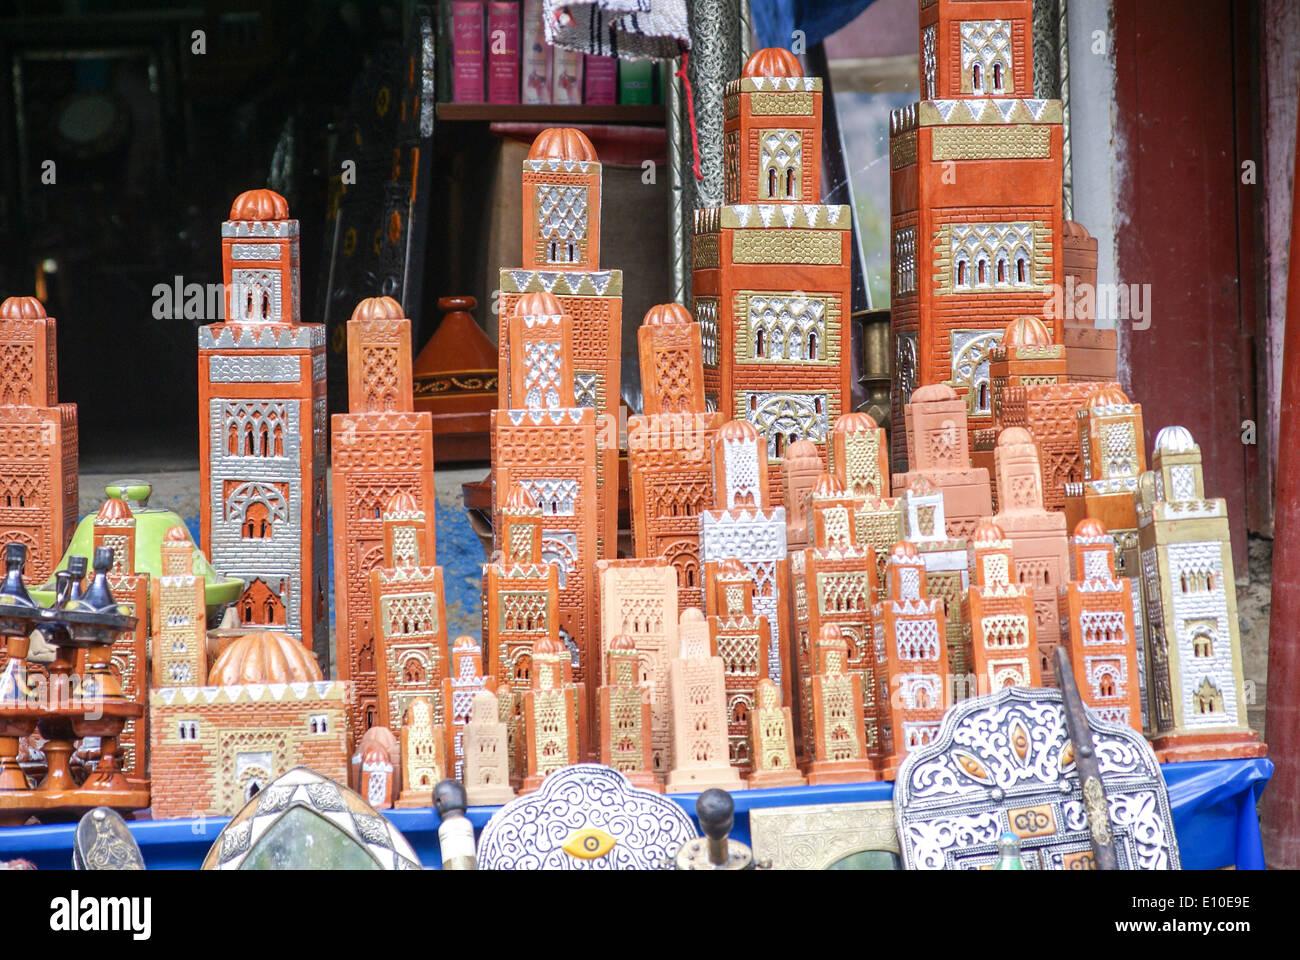 Souvenir shop in the Ourika Valley, Morocco - Stock Image